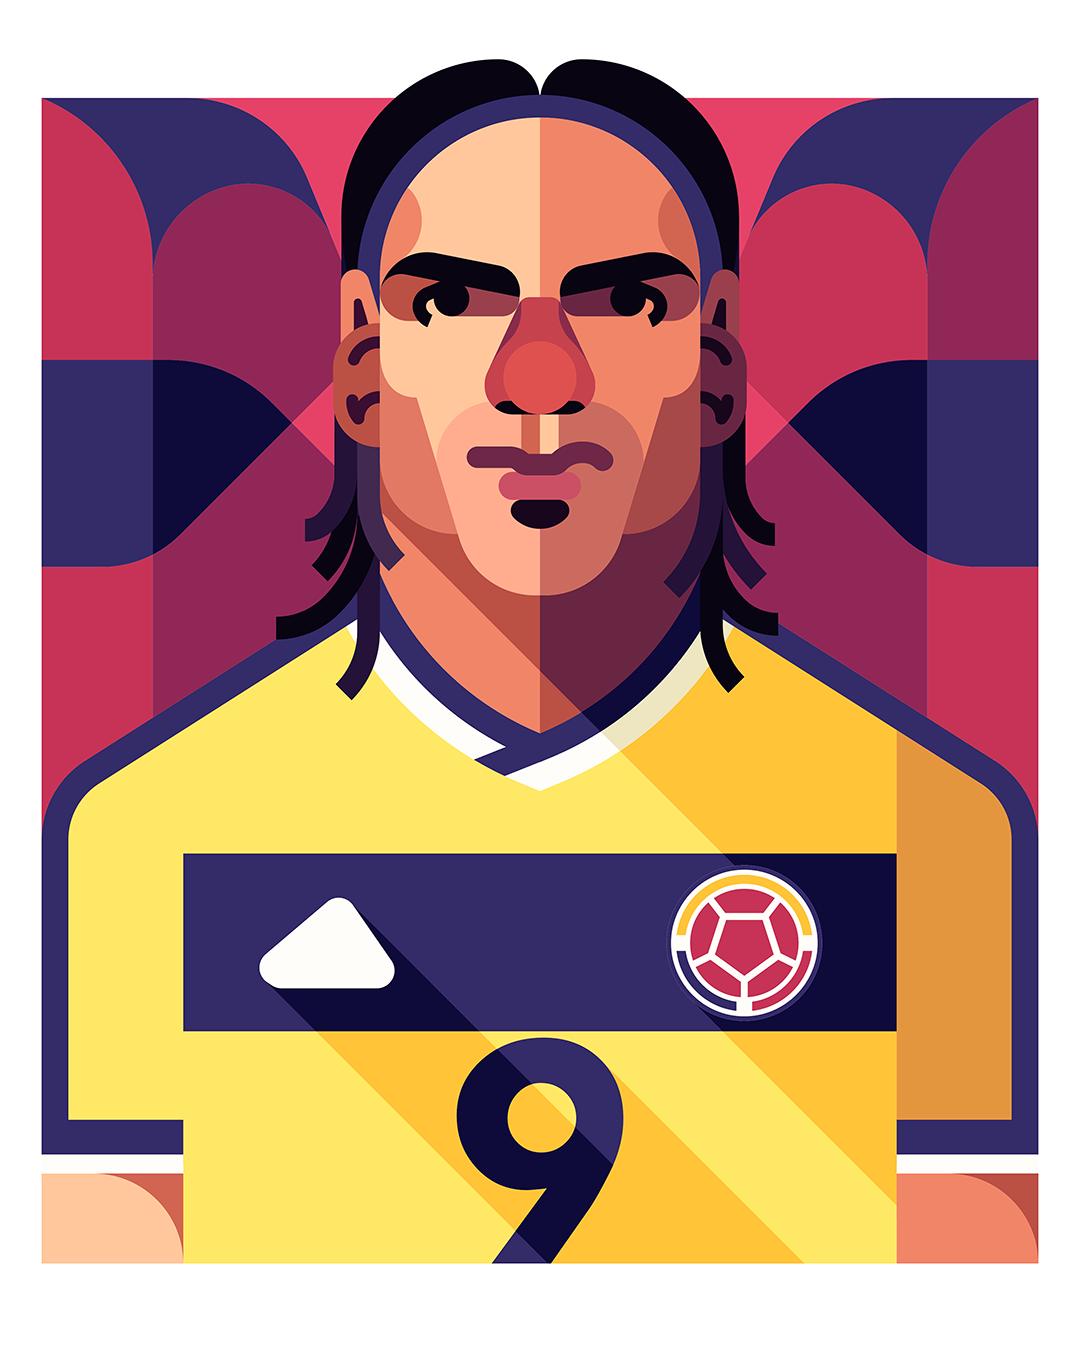 Football Players Vector Illustrations by Daniel Nyari.